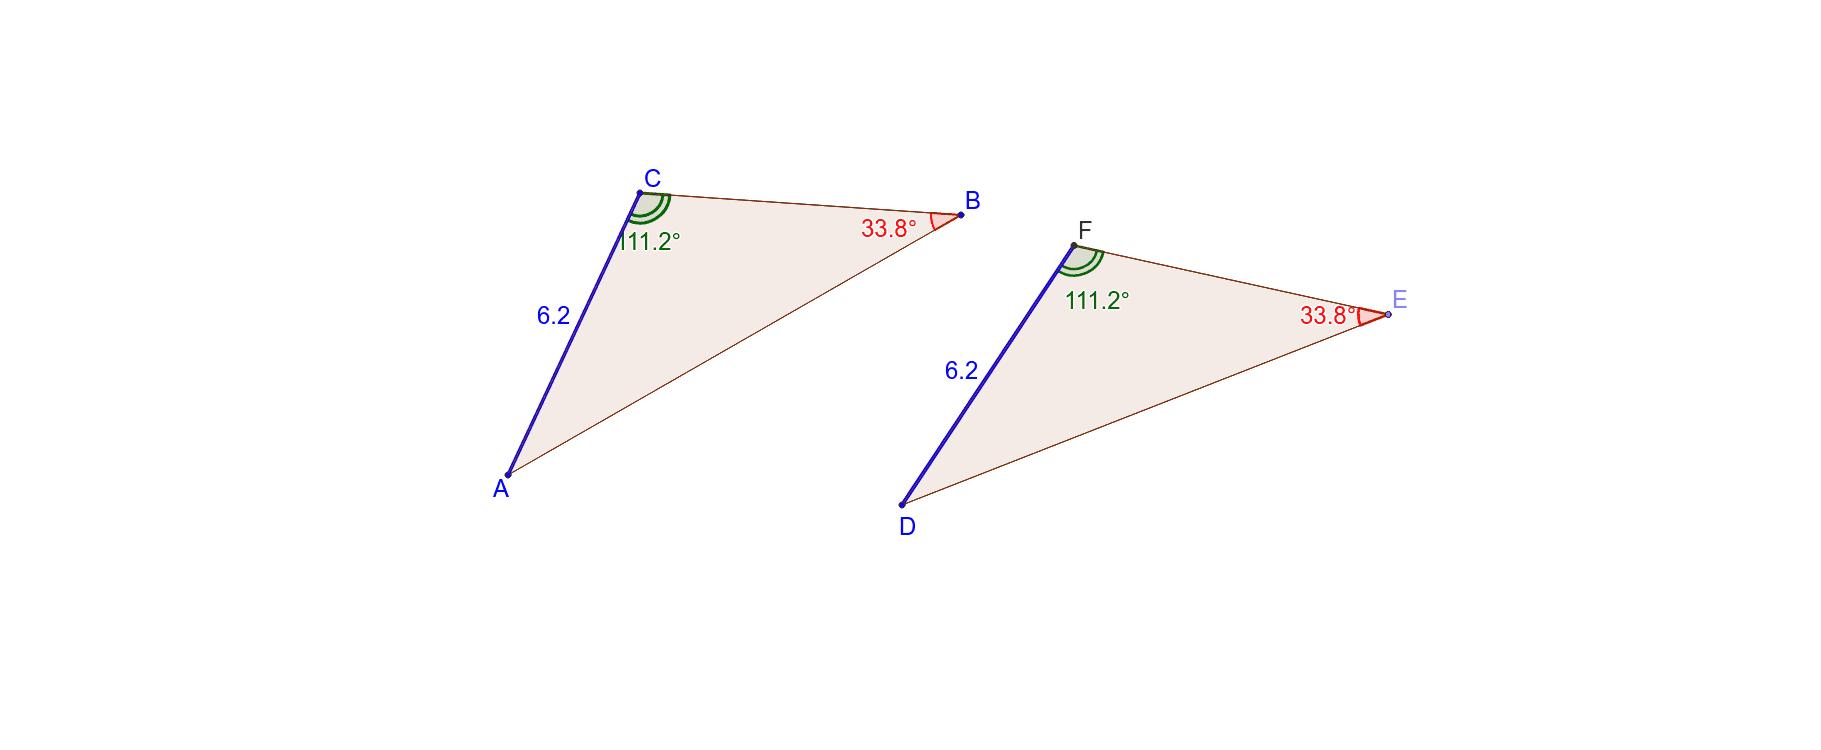 Angle-Angle-Side Press Enter to start activity